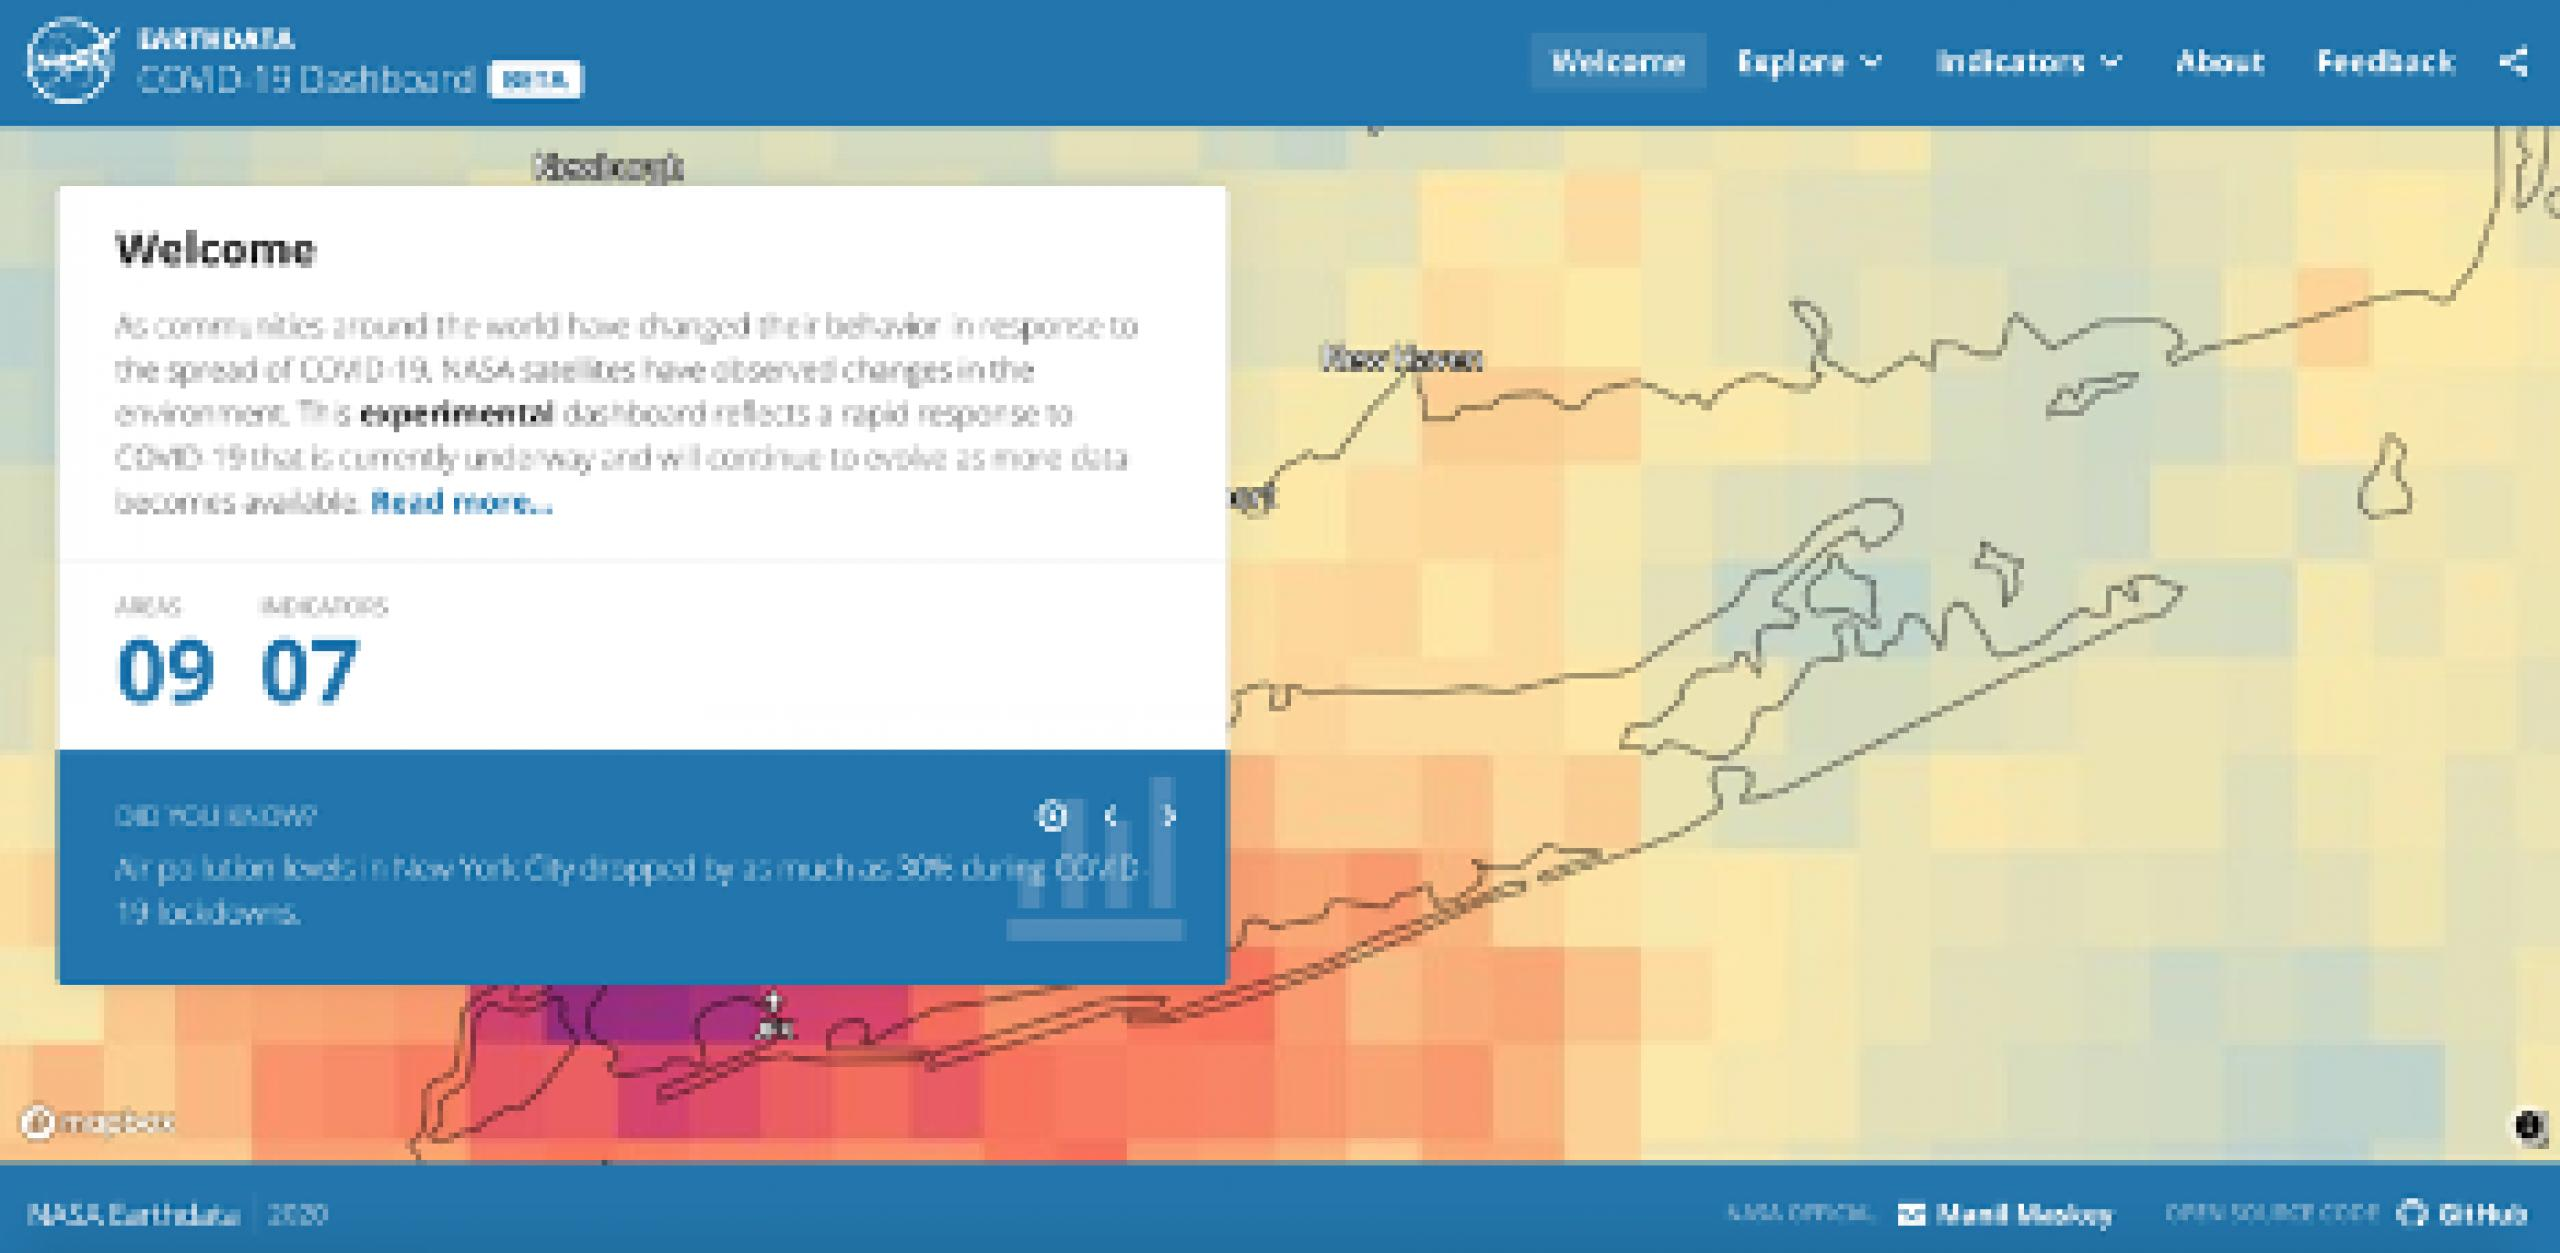 Screenshot of website application for COVID data